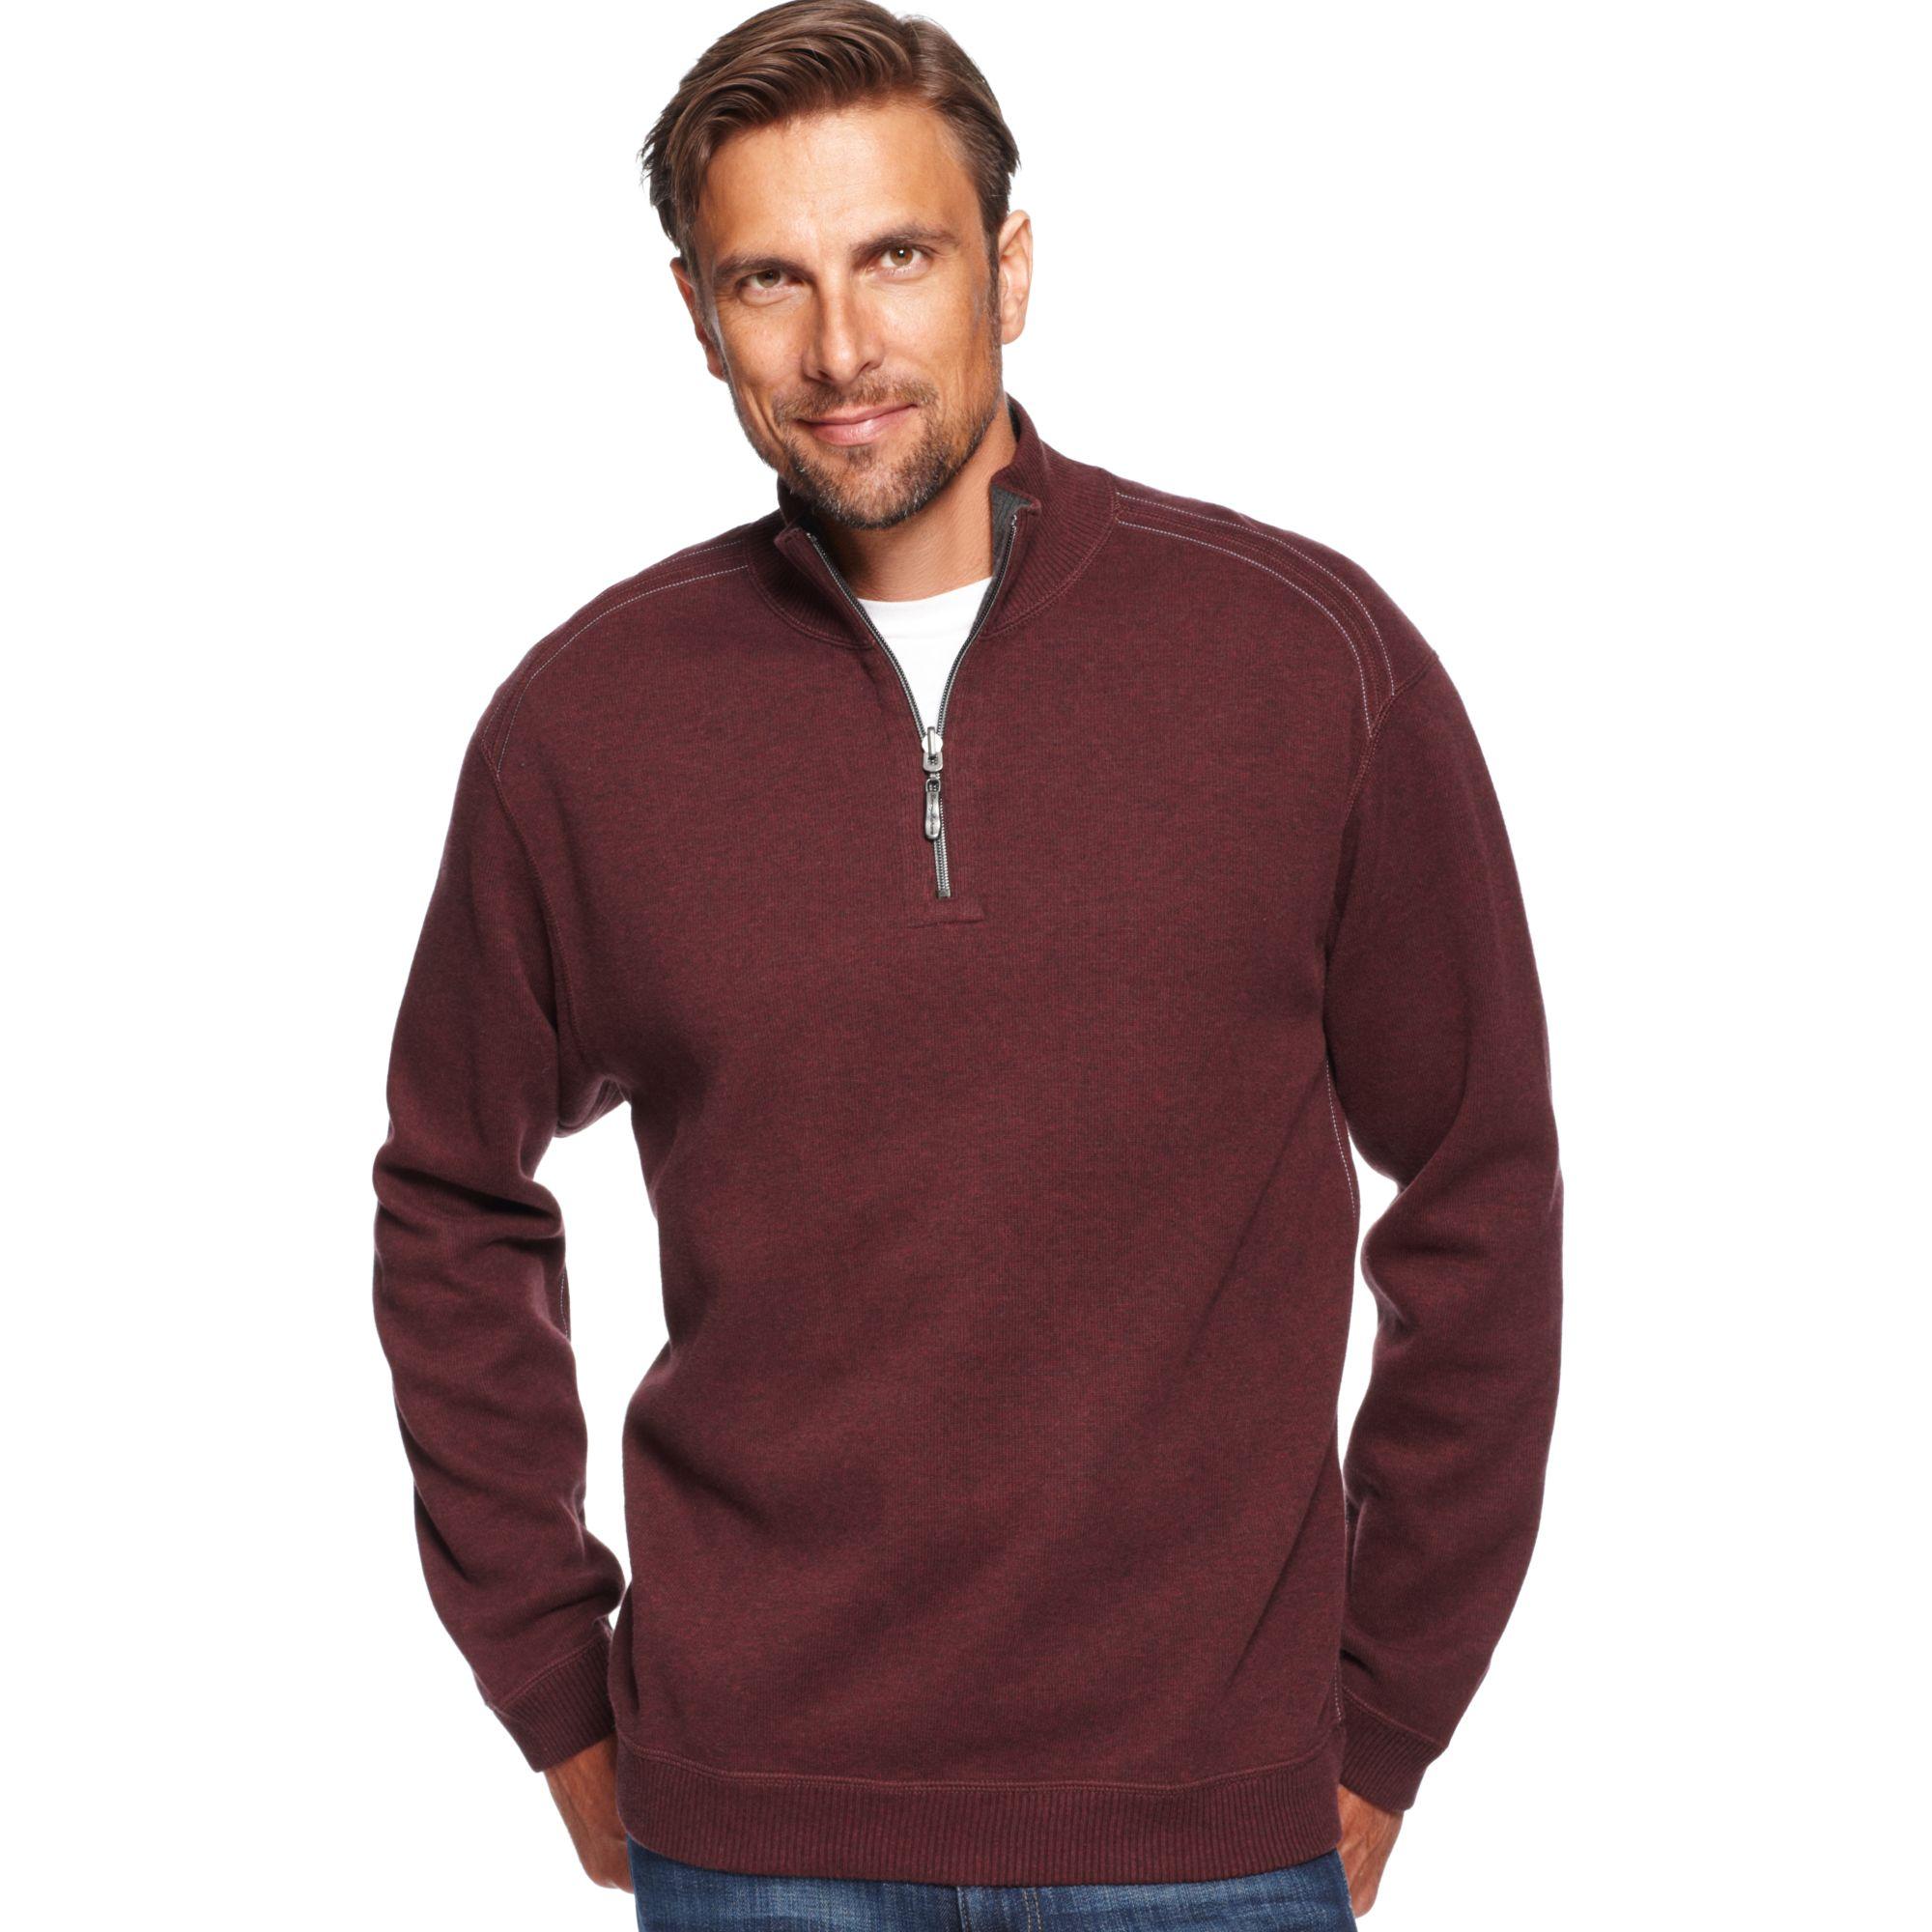 Tommy Bahama Flip Side Pro Half Zip Sweater In Red For Men